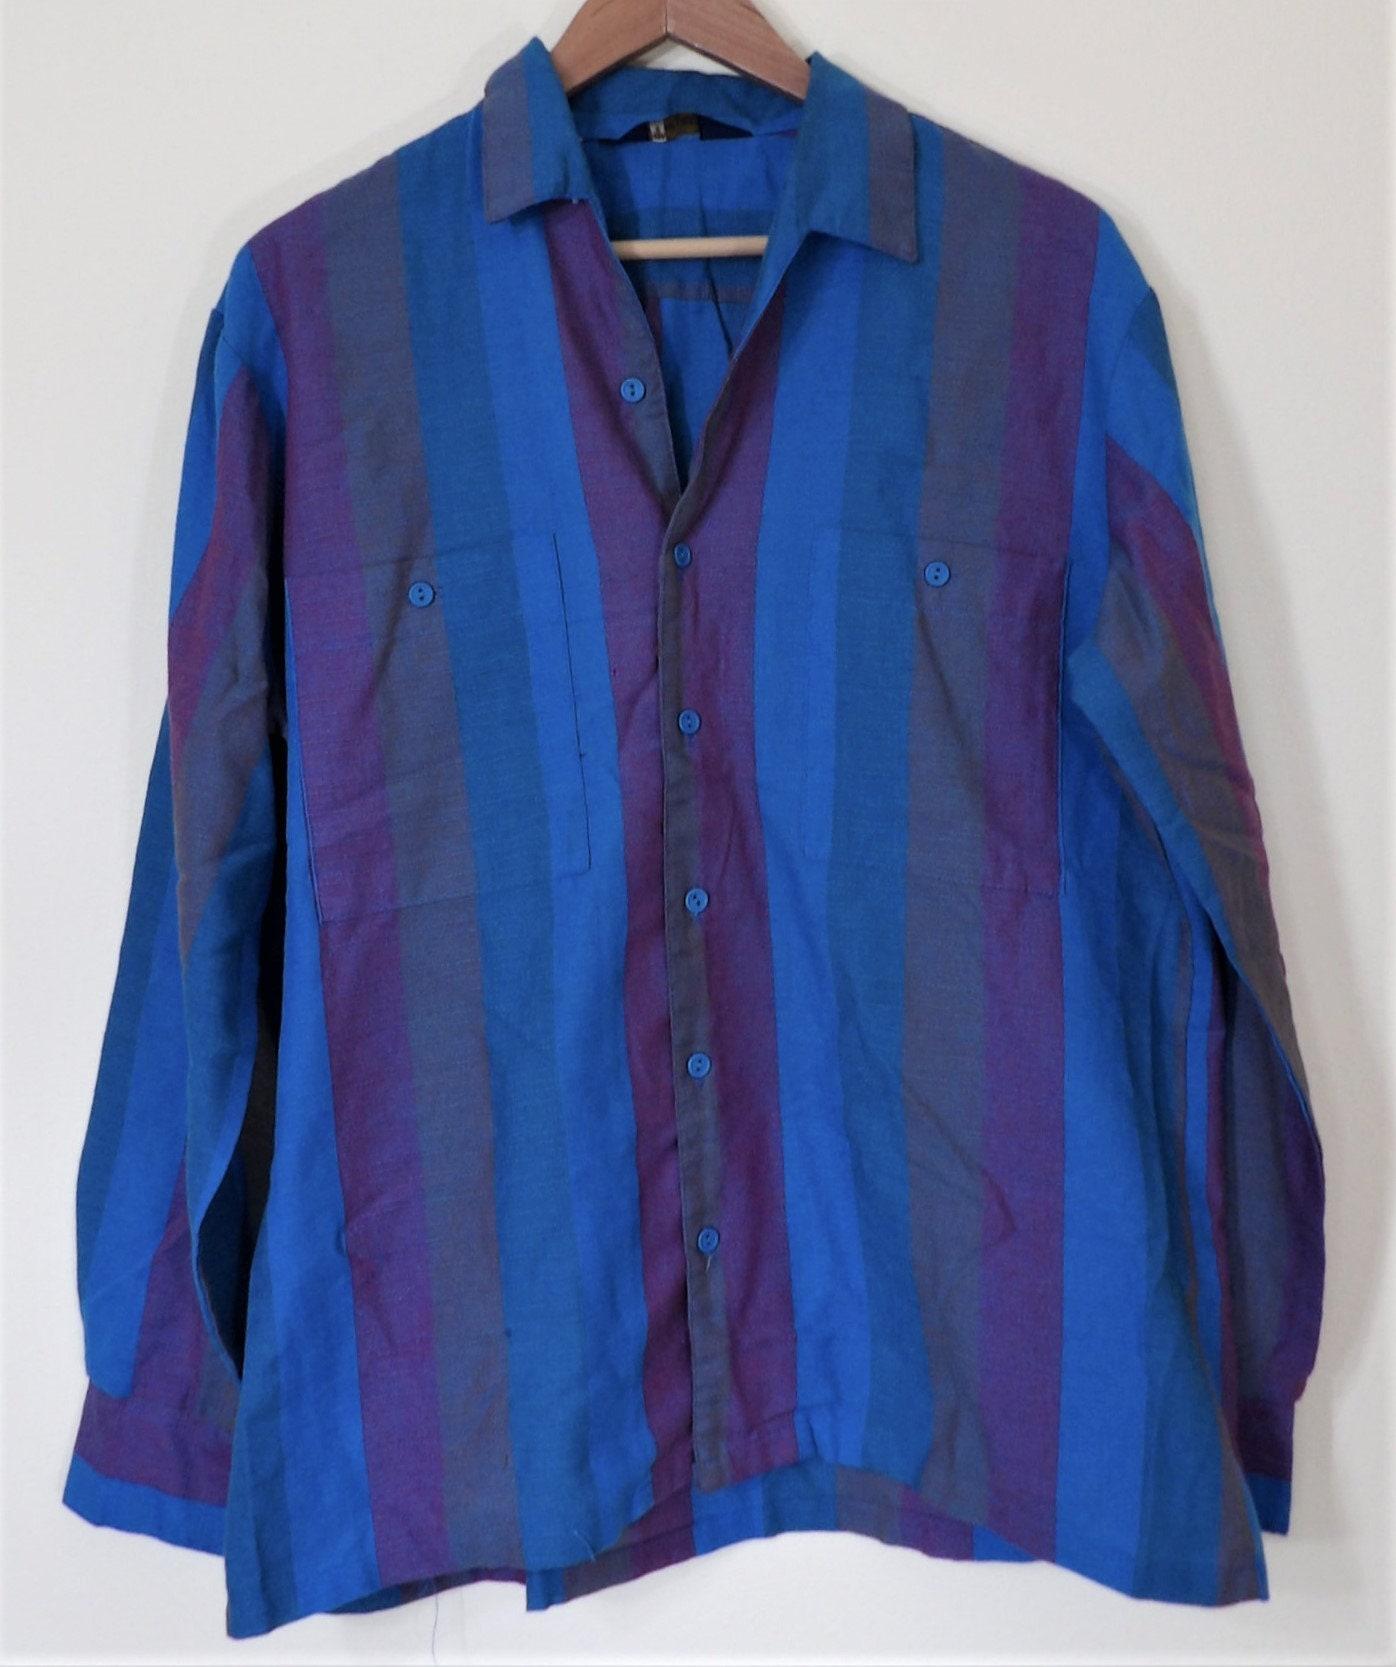 1960s – 70s Men's Ties | Skinny Ties, Slim Ties 1960s Vintage California Gold Jewel-Tone Striped Slub PolyCotton Long Sleeve Shirt Mens Large Made in Usa $24.99 AT vintagedancer.com